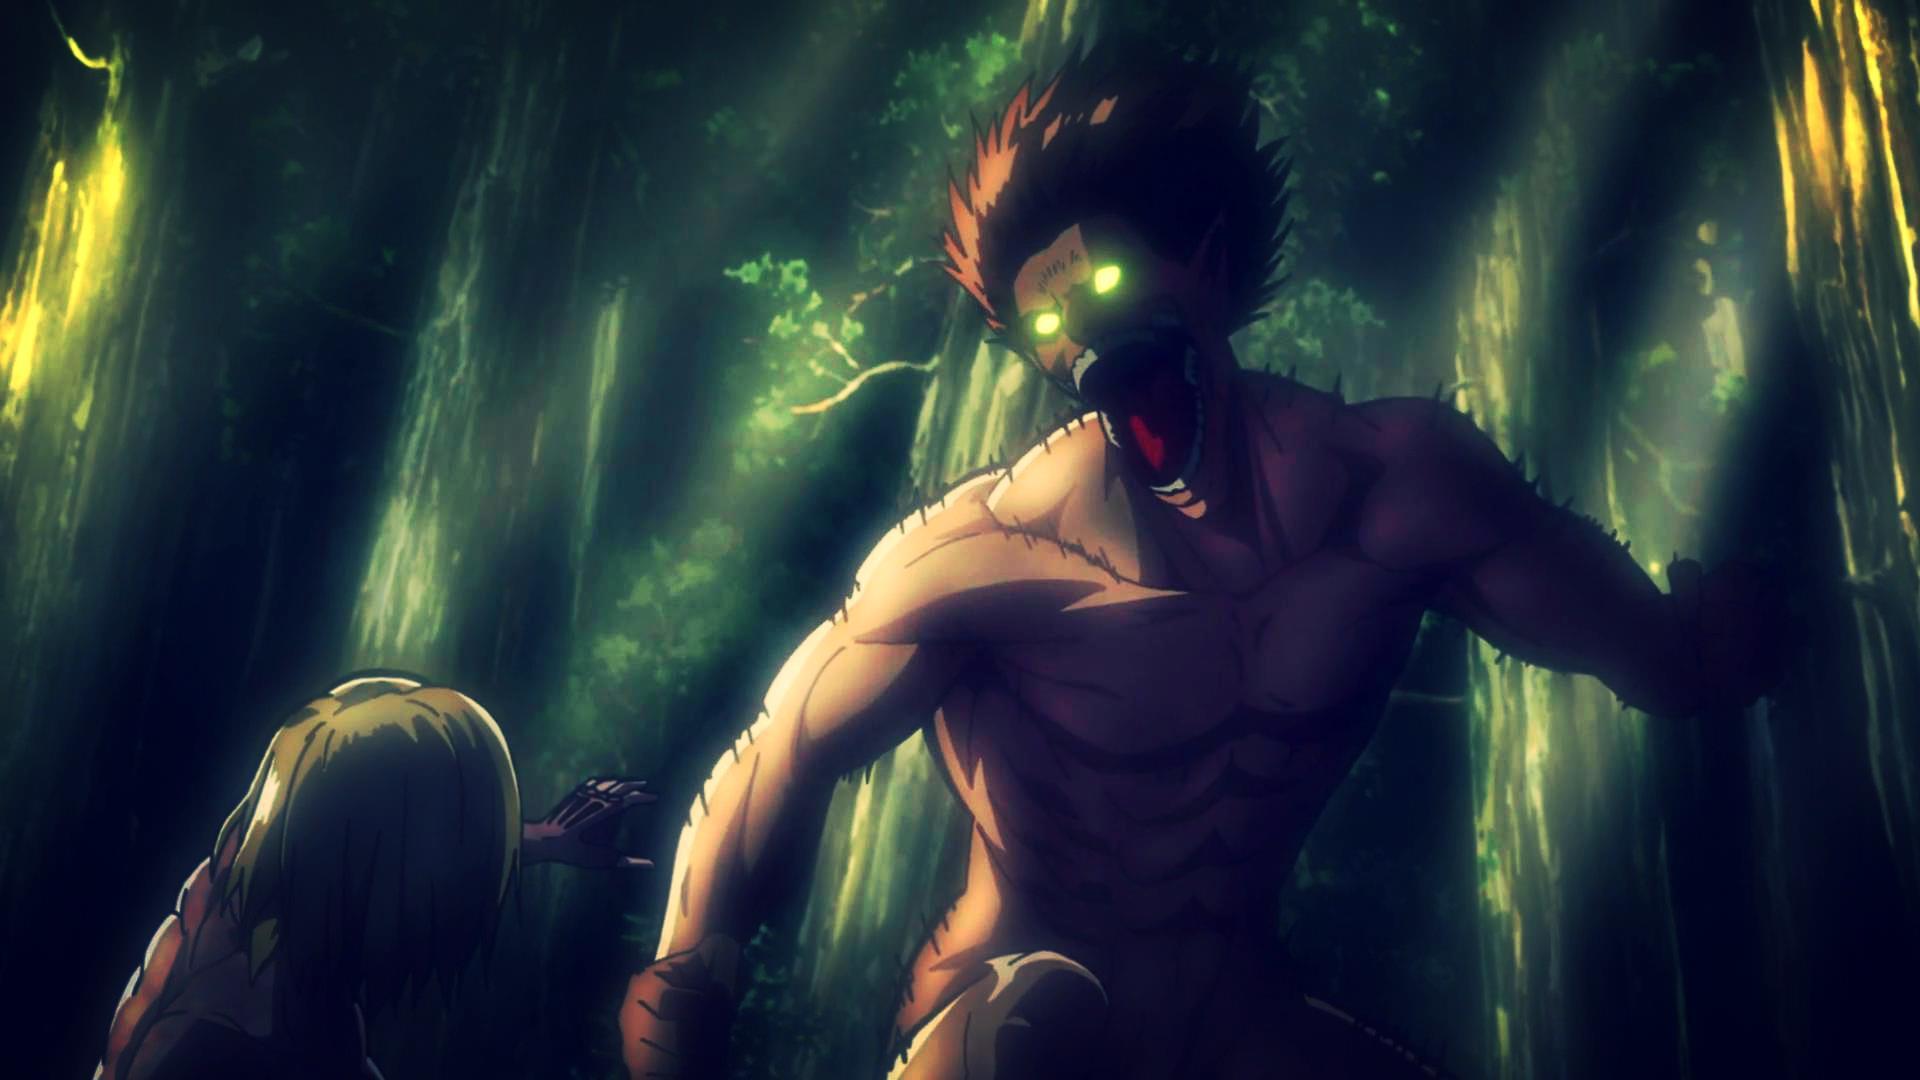 Hajime isayama, kodansha/''attack on titan'' production committee attack on titan has taken the anime world by storm. Attack On Titan HD Wallpaper | Background Image ...